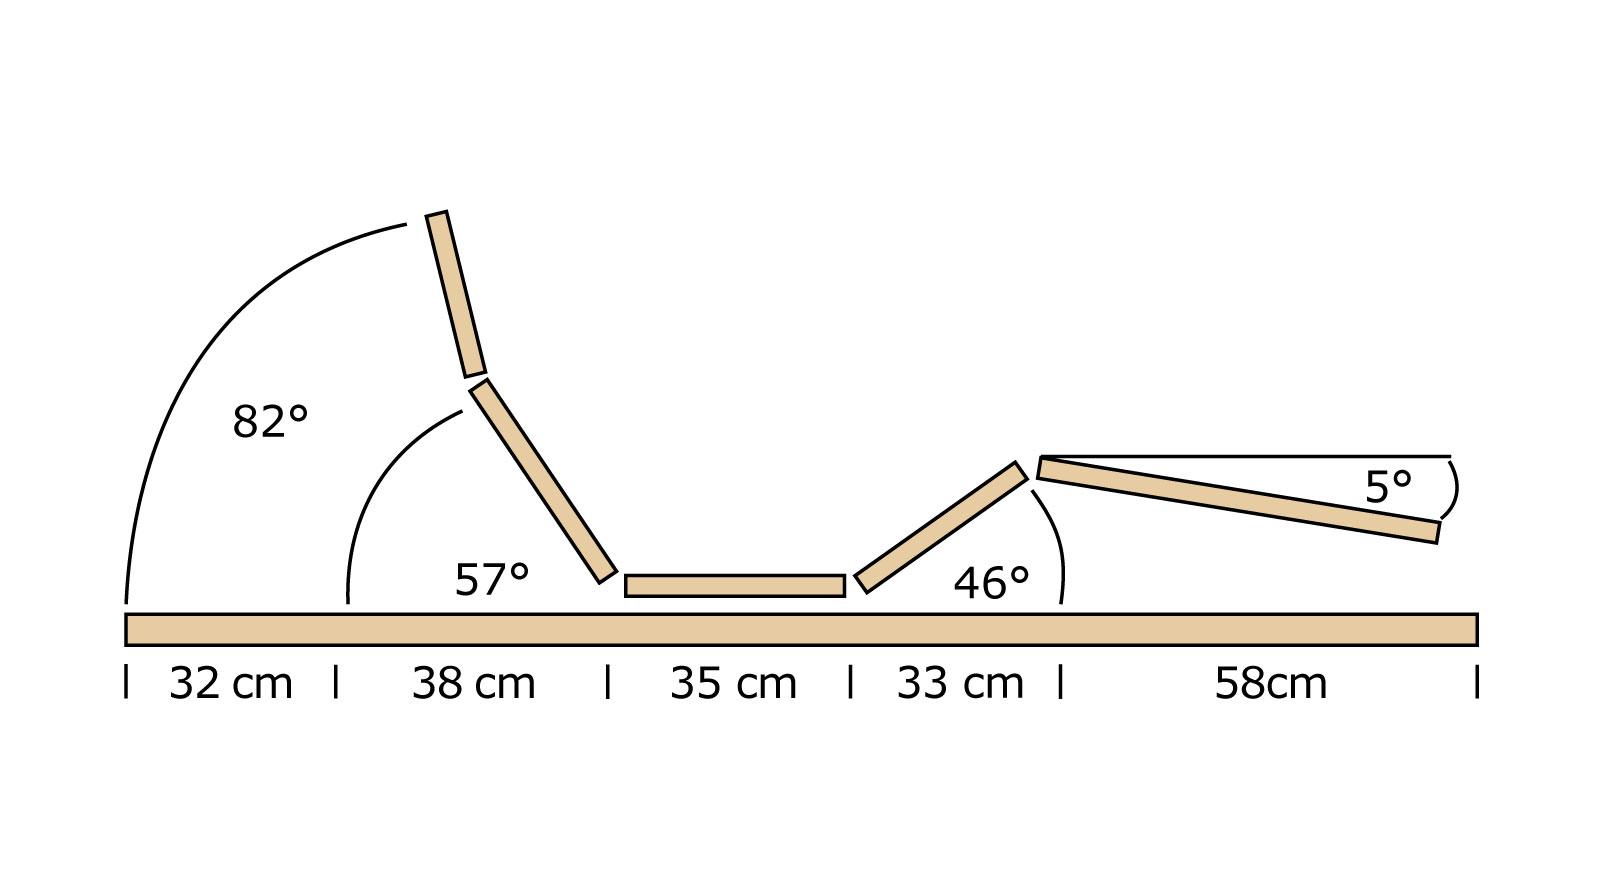 Bemassung des Lattenrosts orthowell liftflex motor